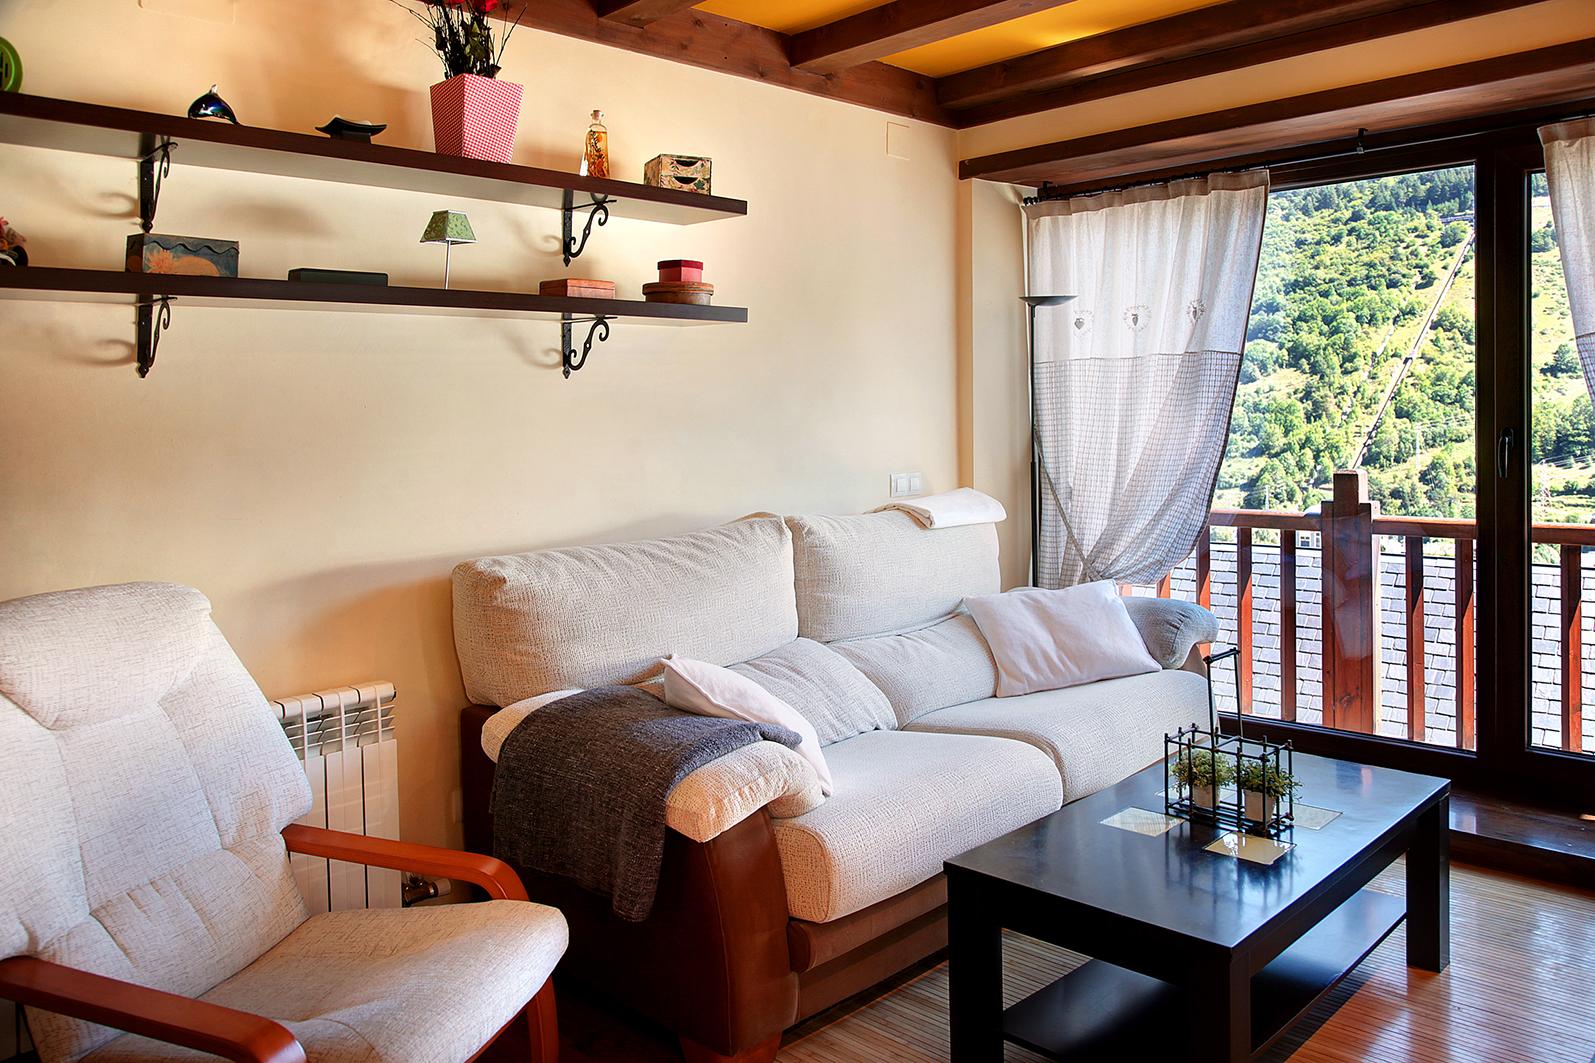 fotografía turismo rural apartamento santeta de arán vielha